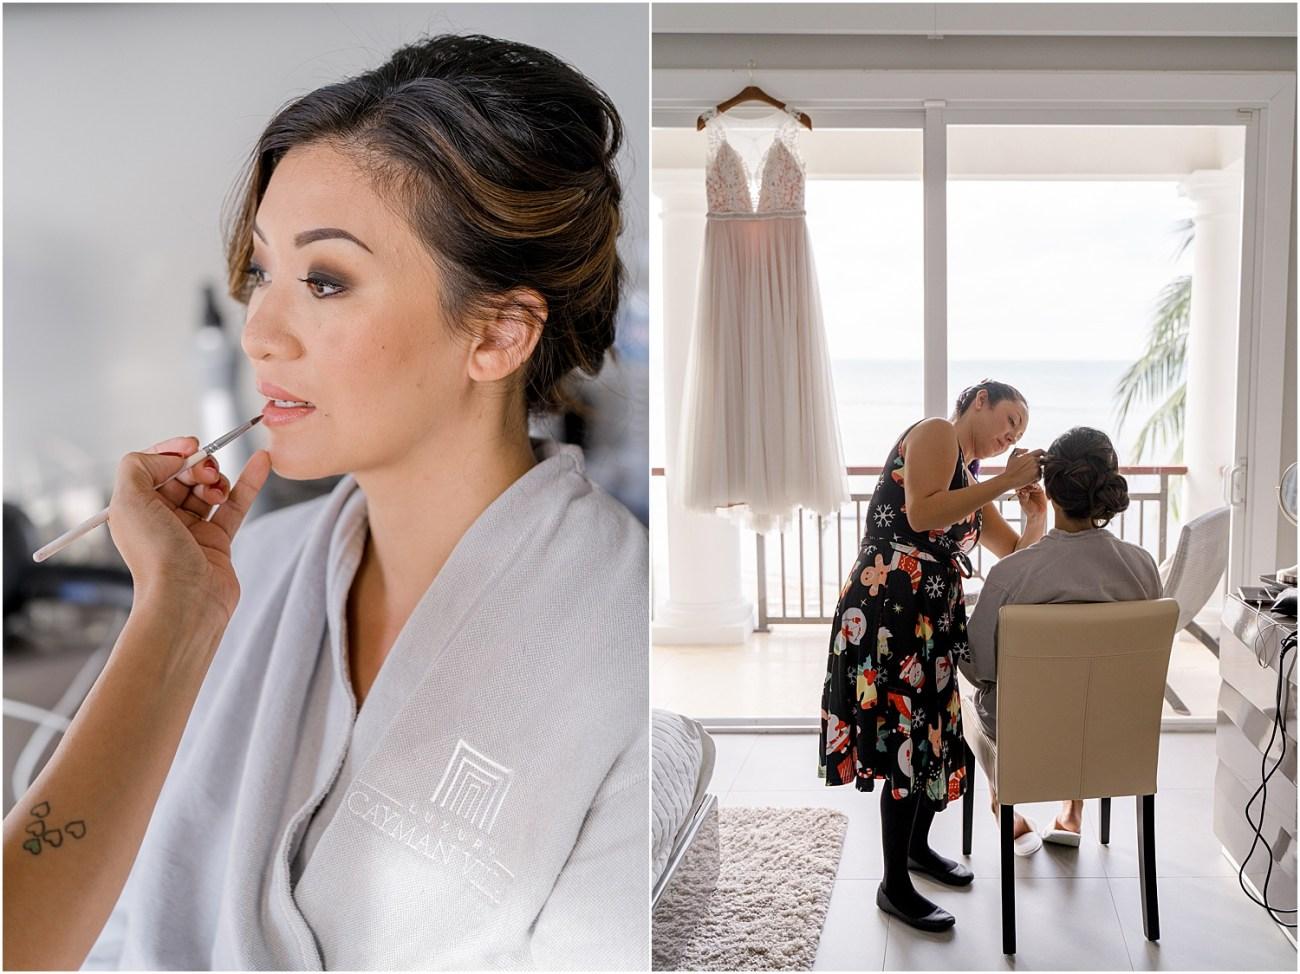 Trina-cayman-make-up-artist_1.jpg